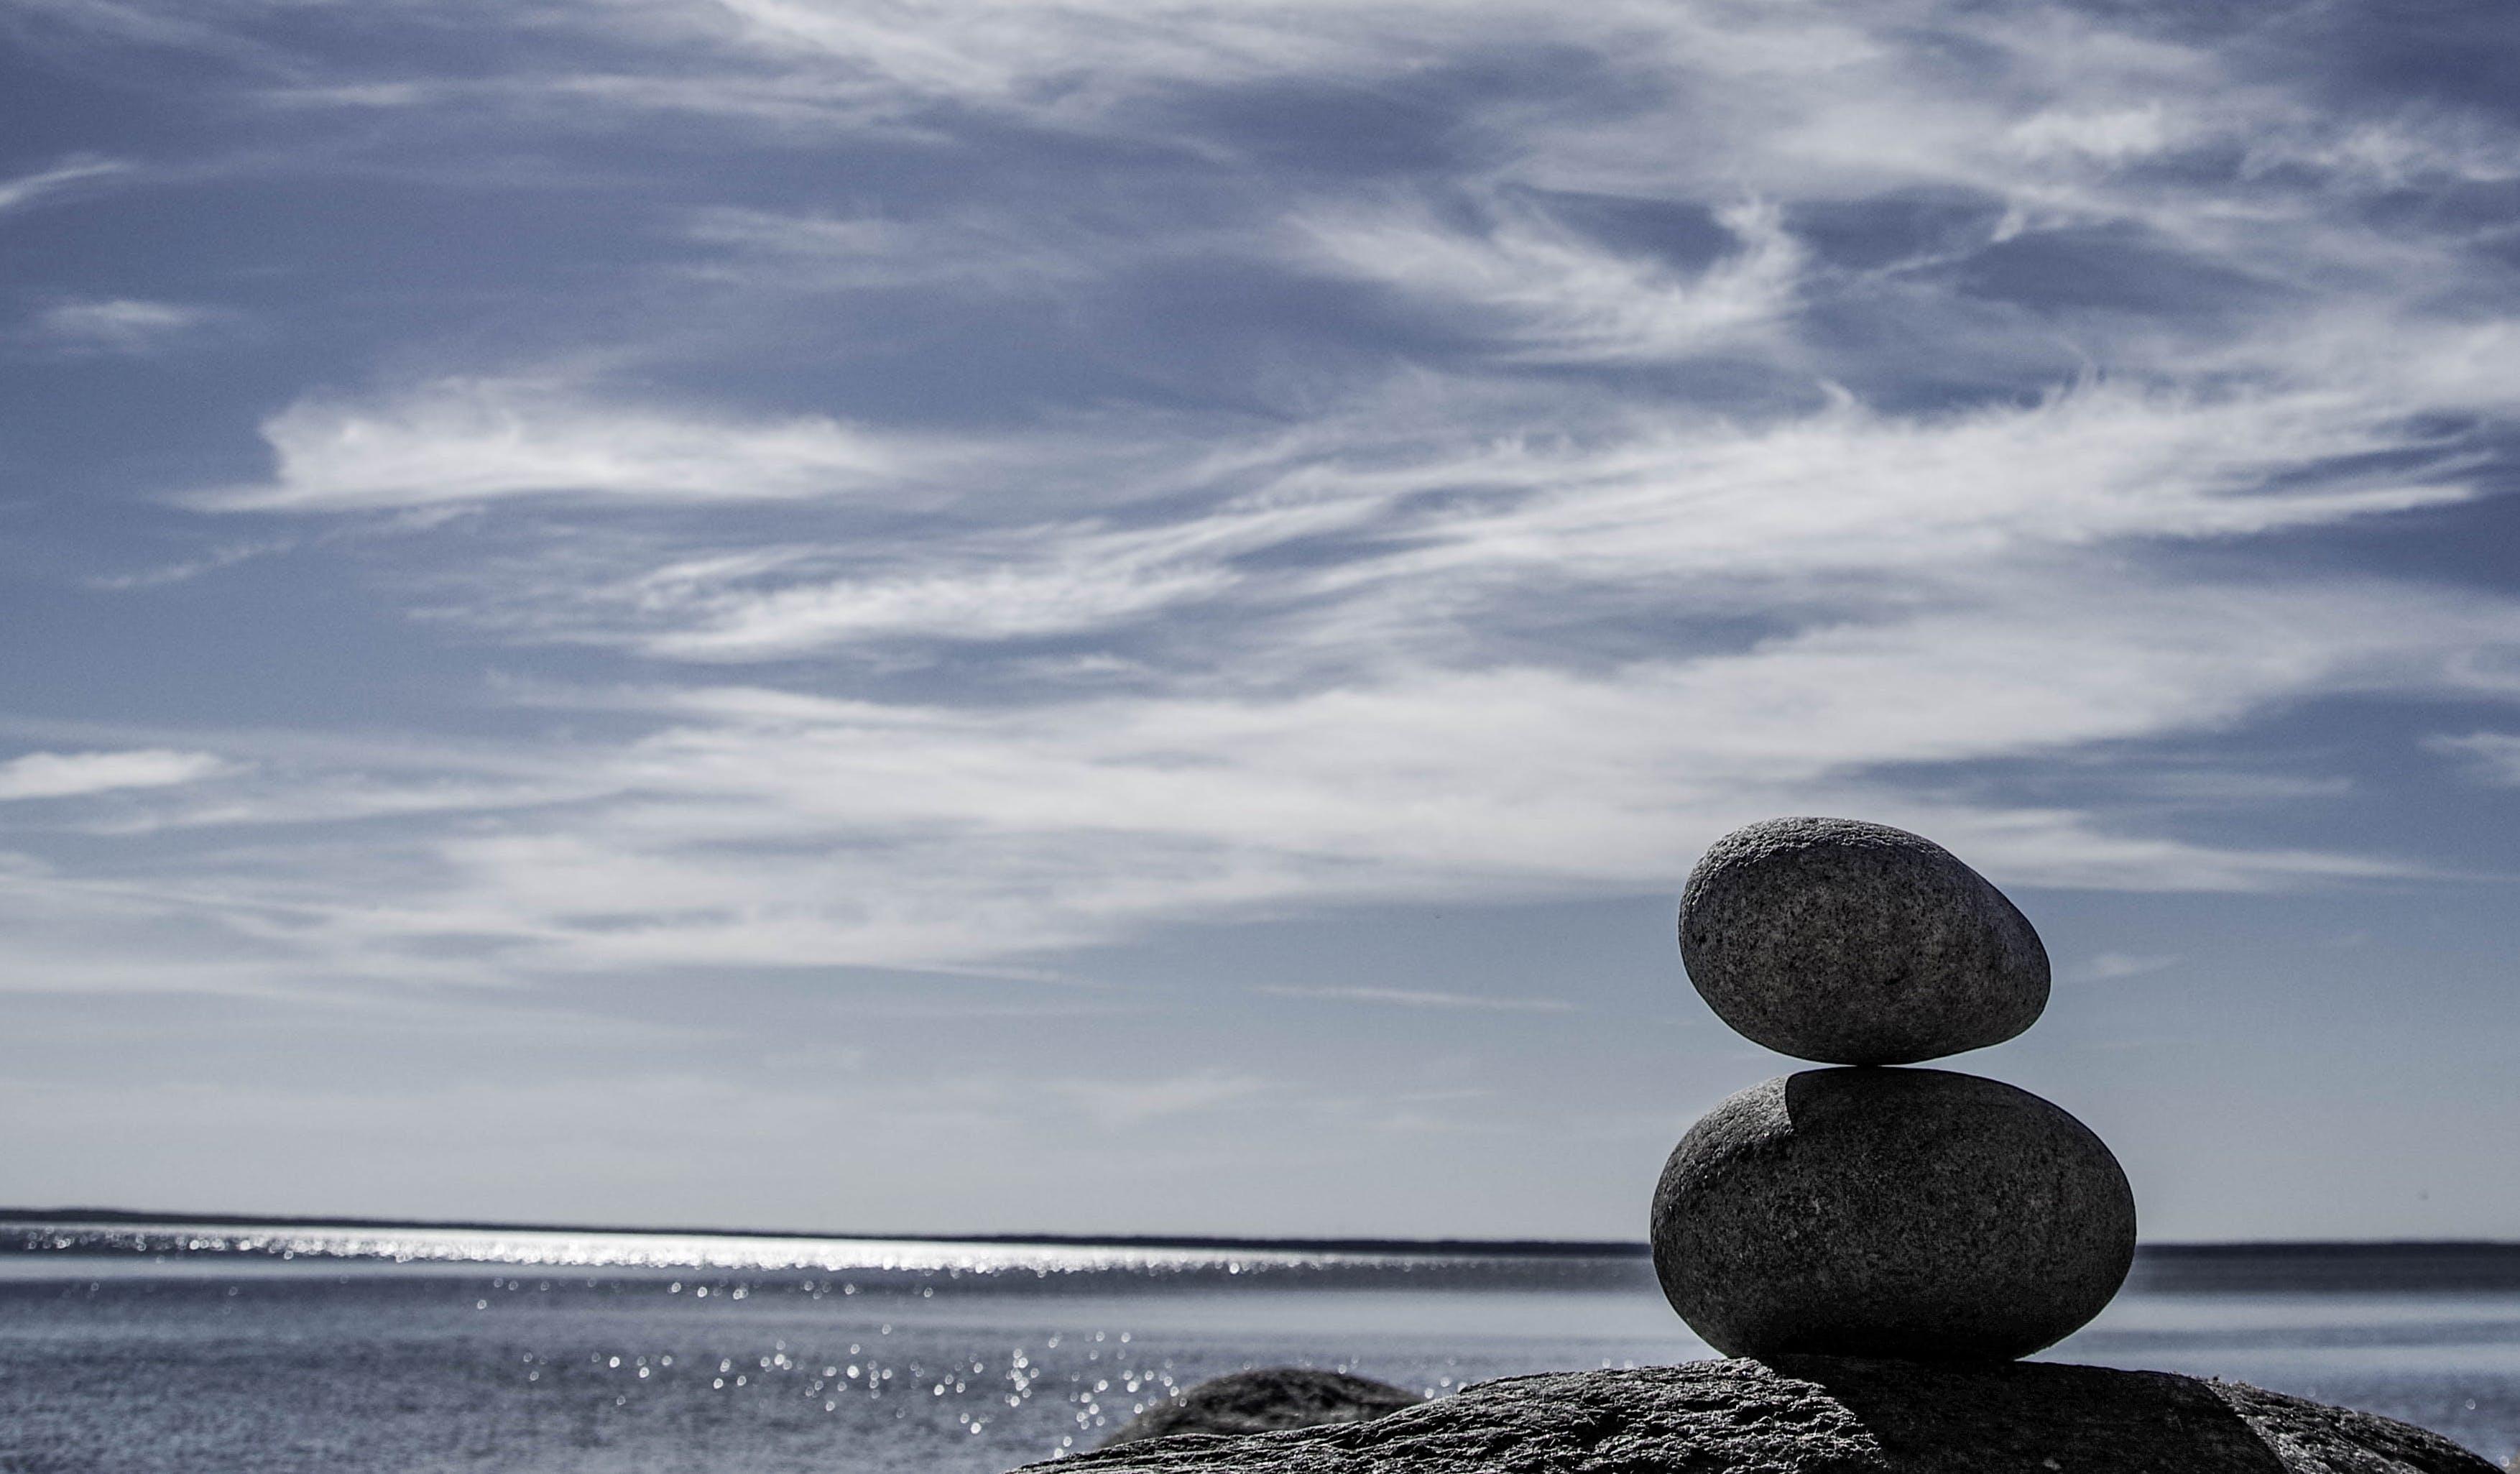 Kostenloses Stock Foto zu balance, felsen, friedlich, himmel